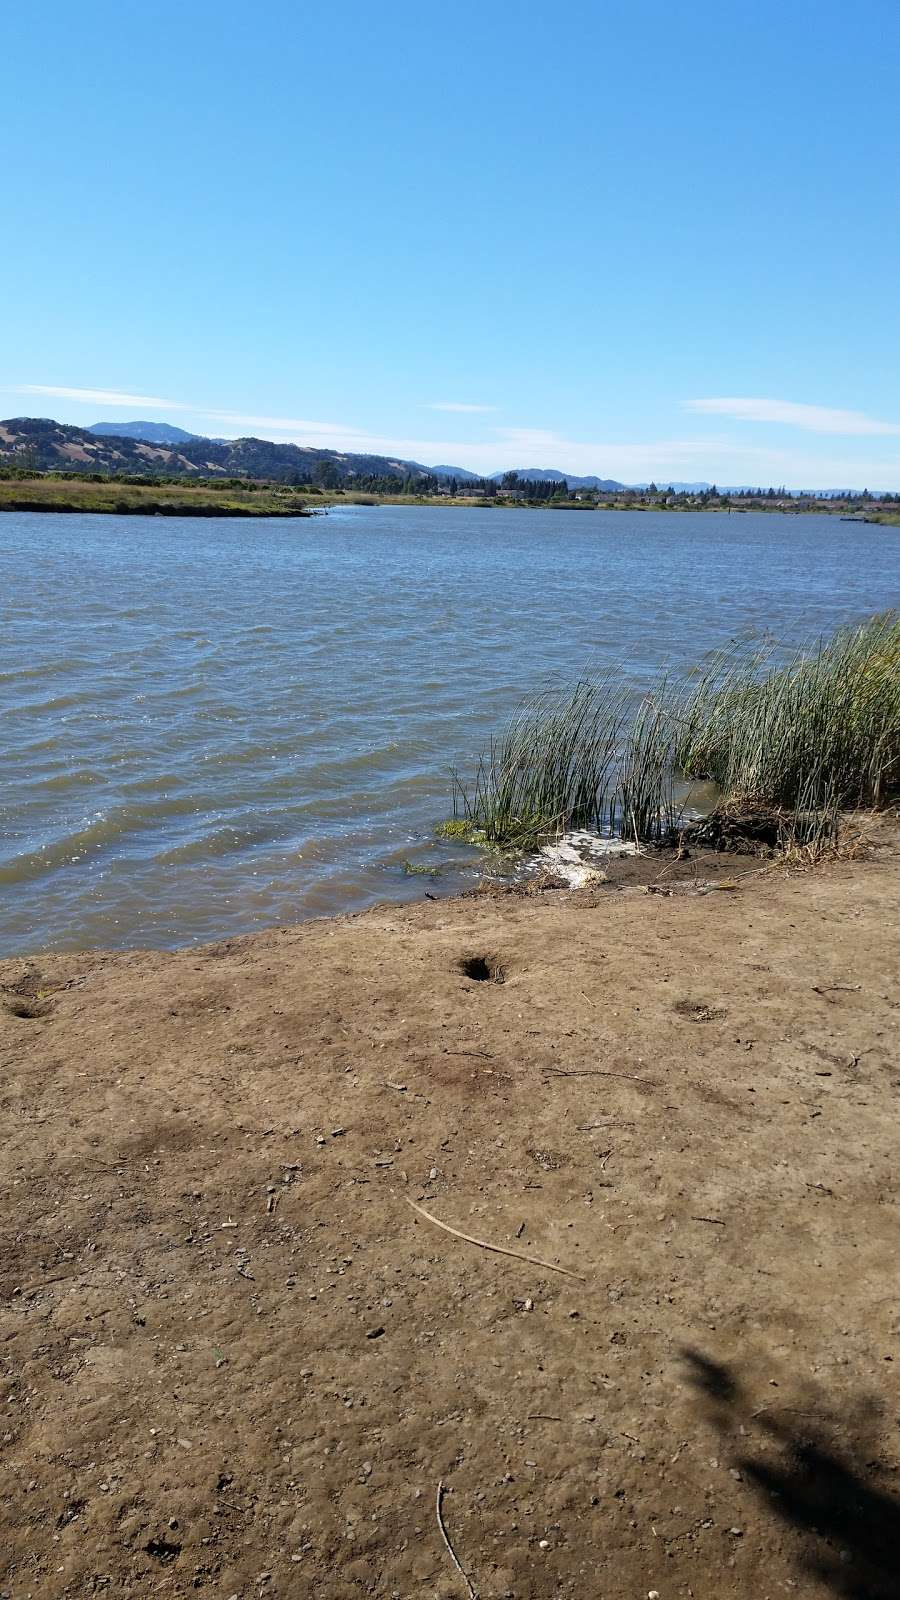 The Meadows of Napa Valley - health  | Photo 8 of 10 | Address: 1800 Atrium Pkwy, Napa, CA 94559, USA | Phone: (707) 257-7885